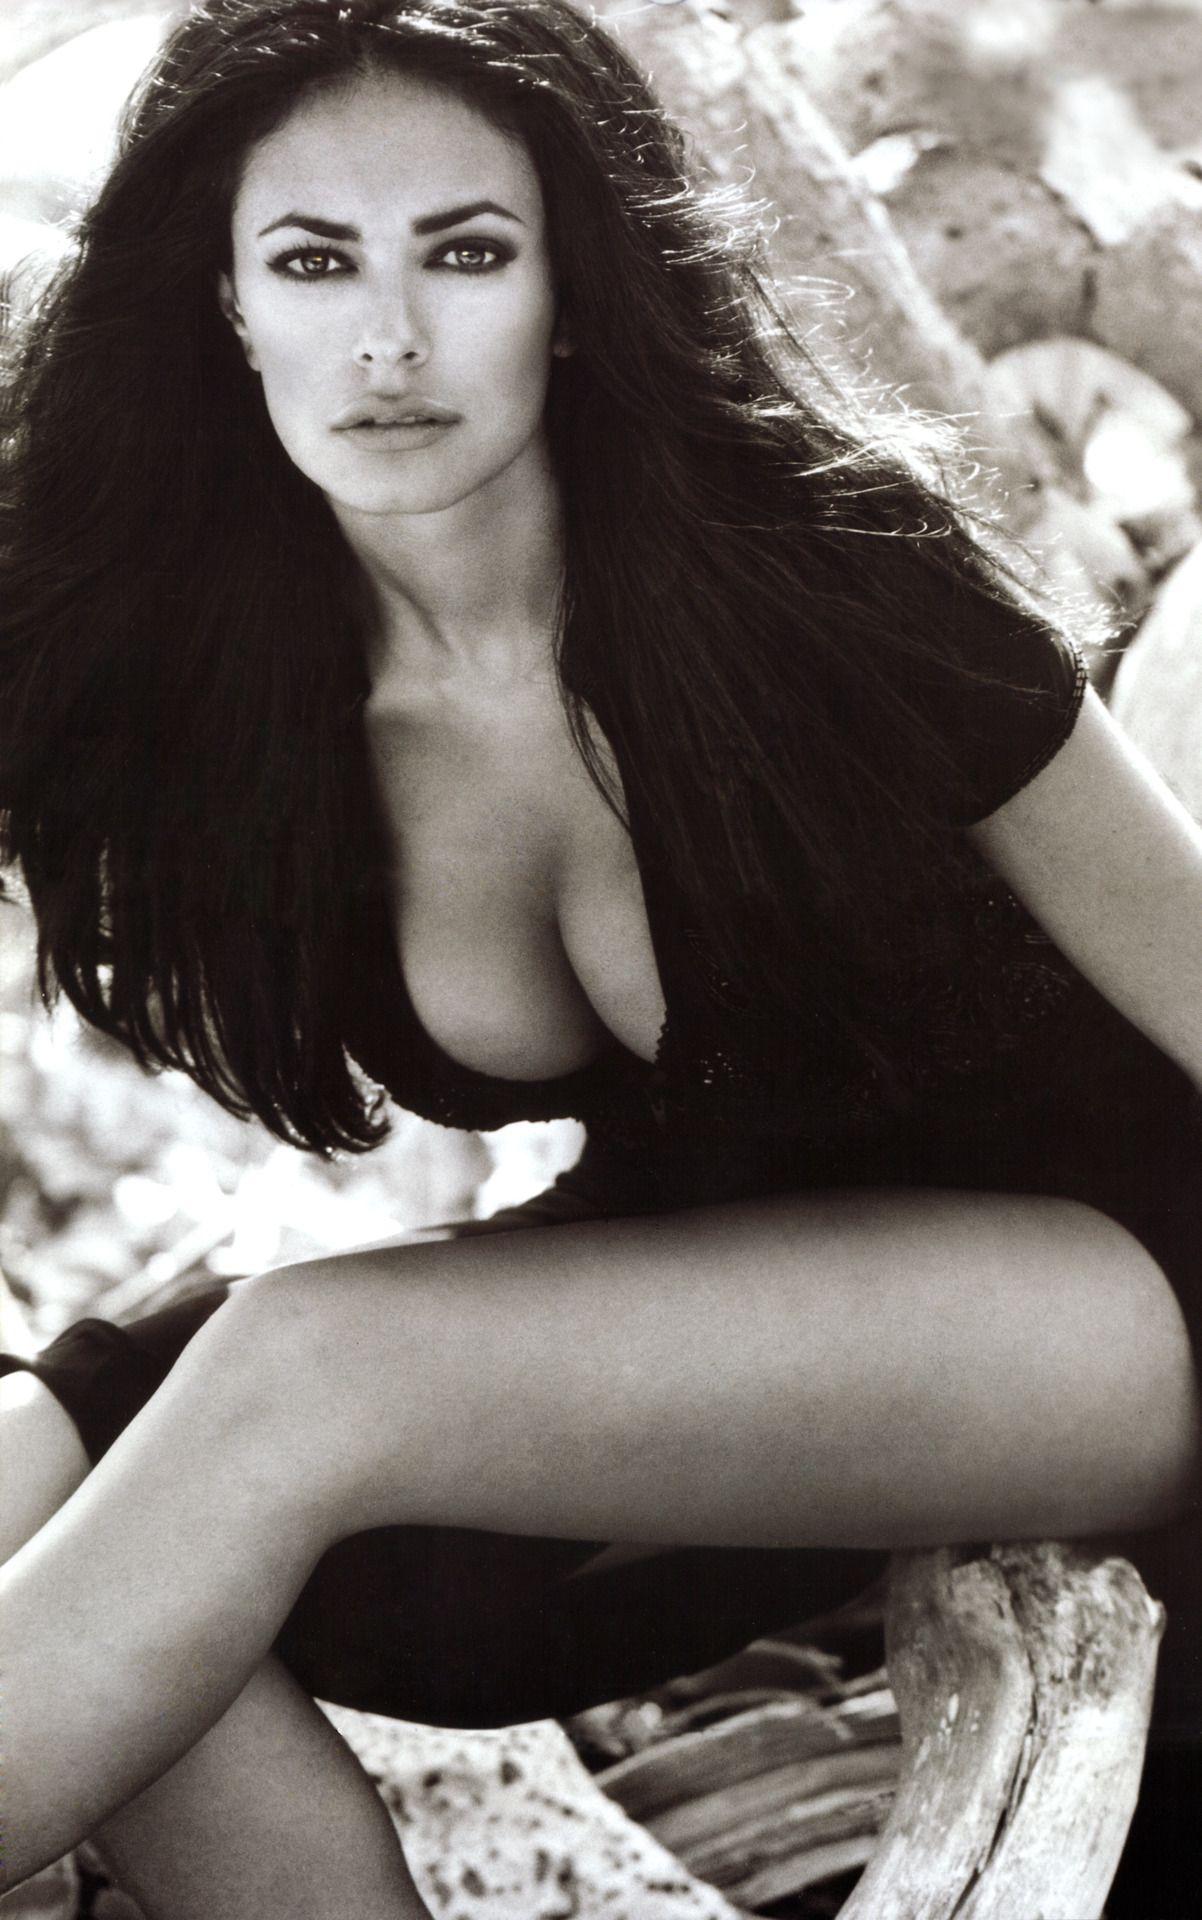 Cucinotta maria bare breasts 13